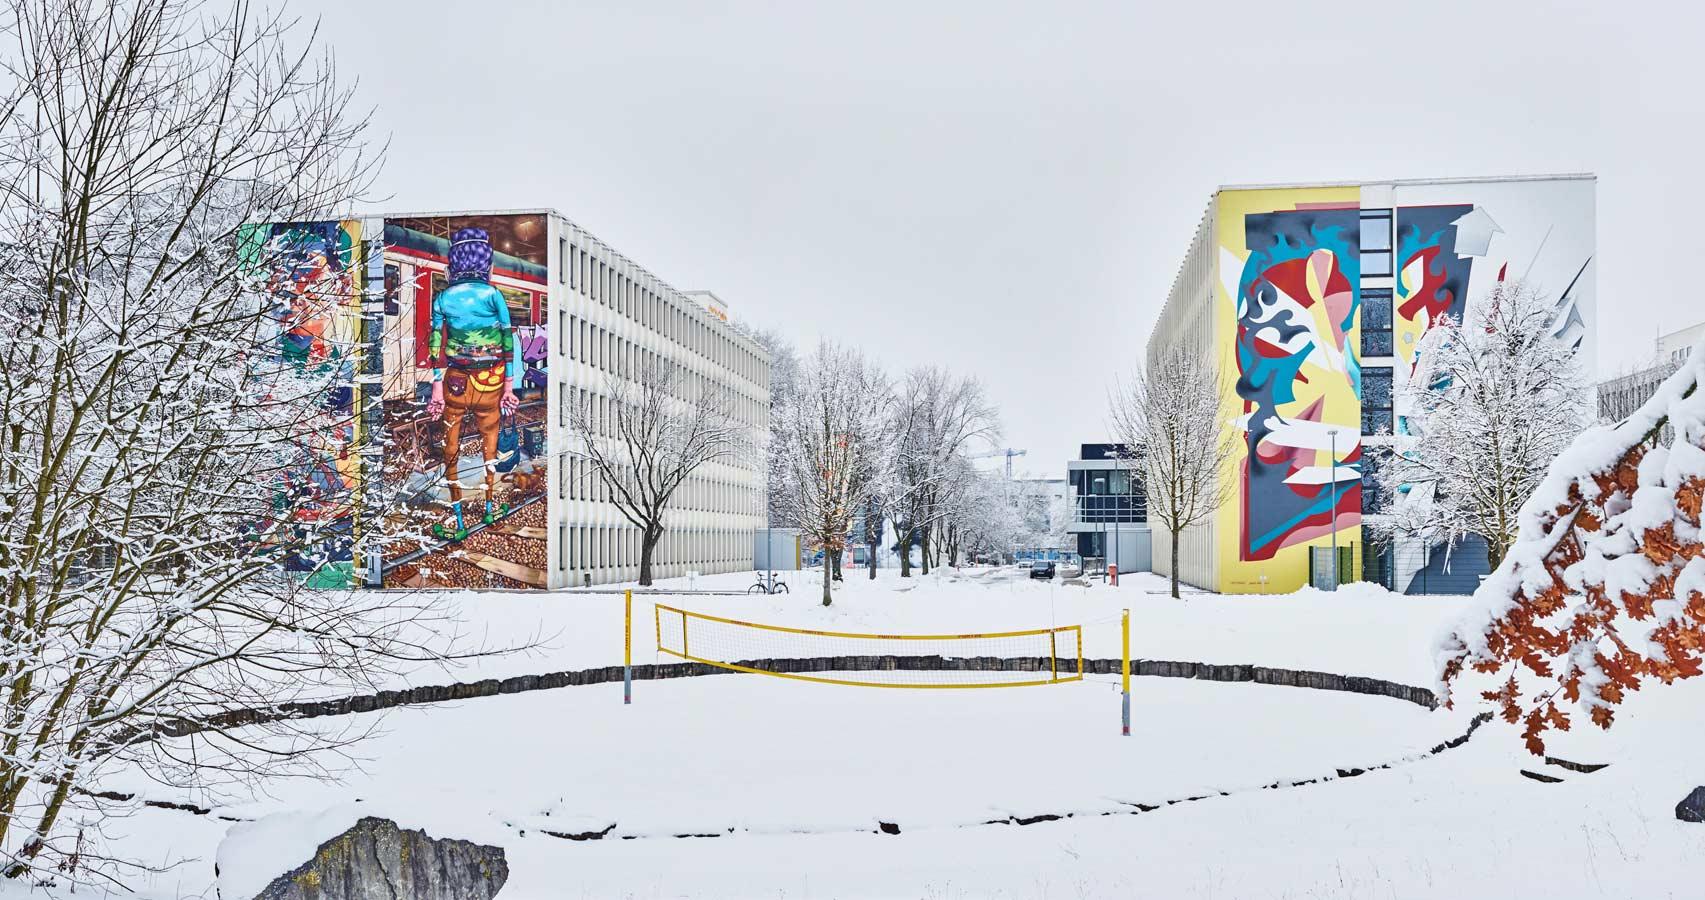 Scale-Street-Art-Siemens-Gelaende-Muenchen-2017--11